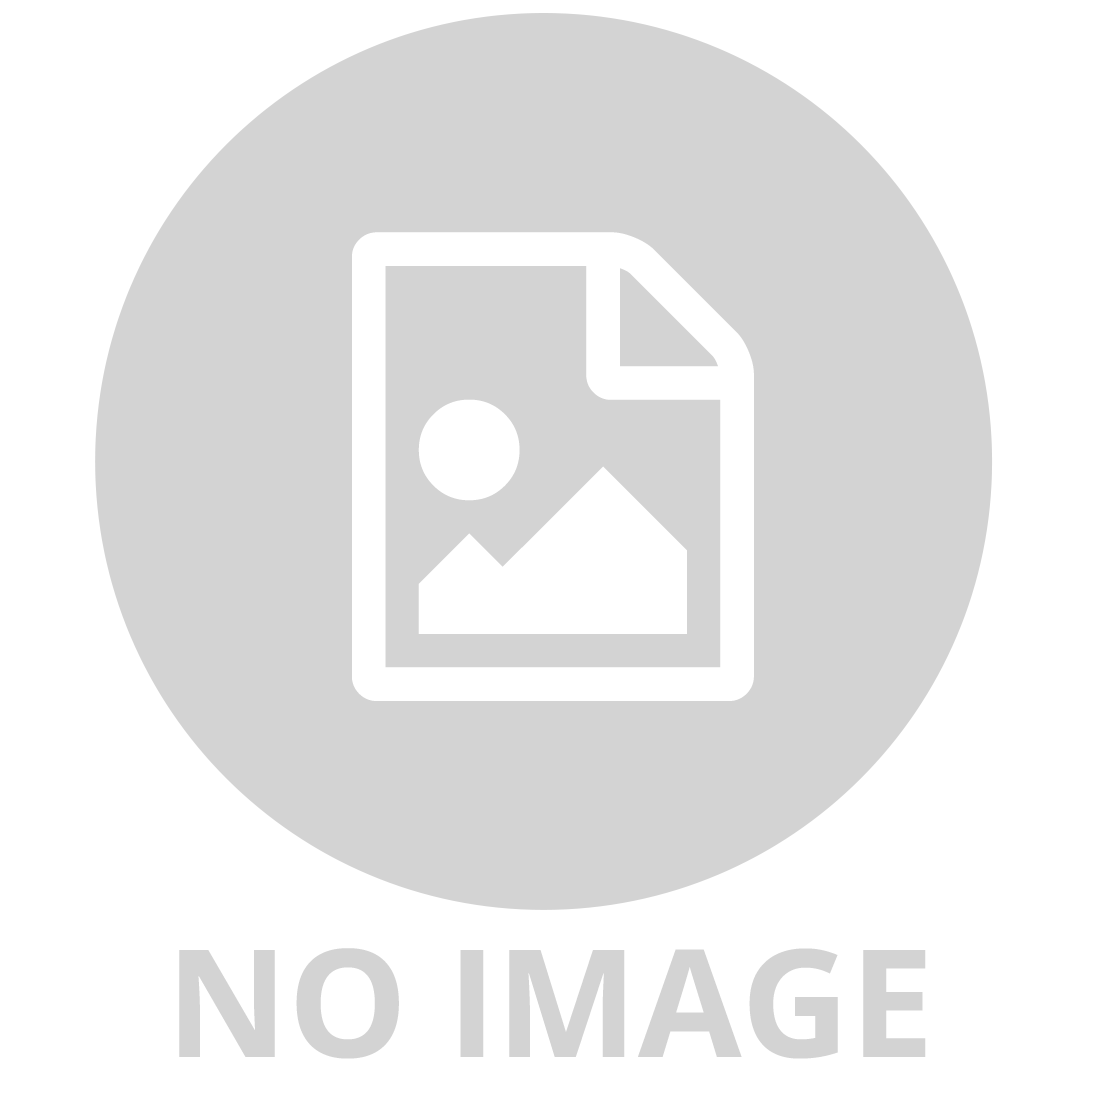 LEGO HARRY POTTER 76383 HOGWARTS MOMENT: POTIONS CLASS